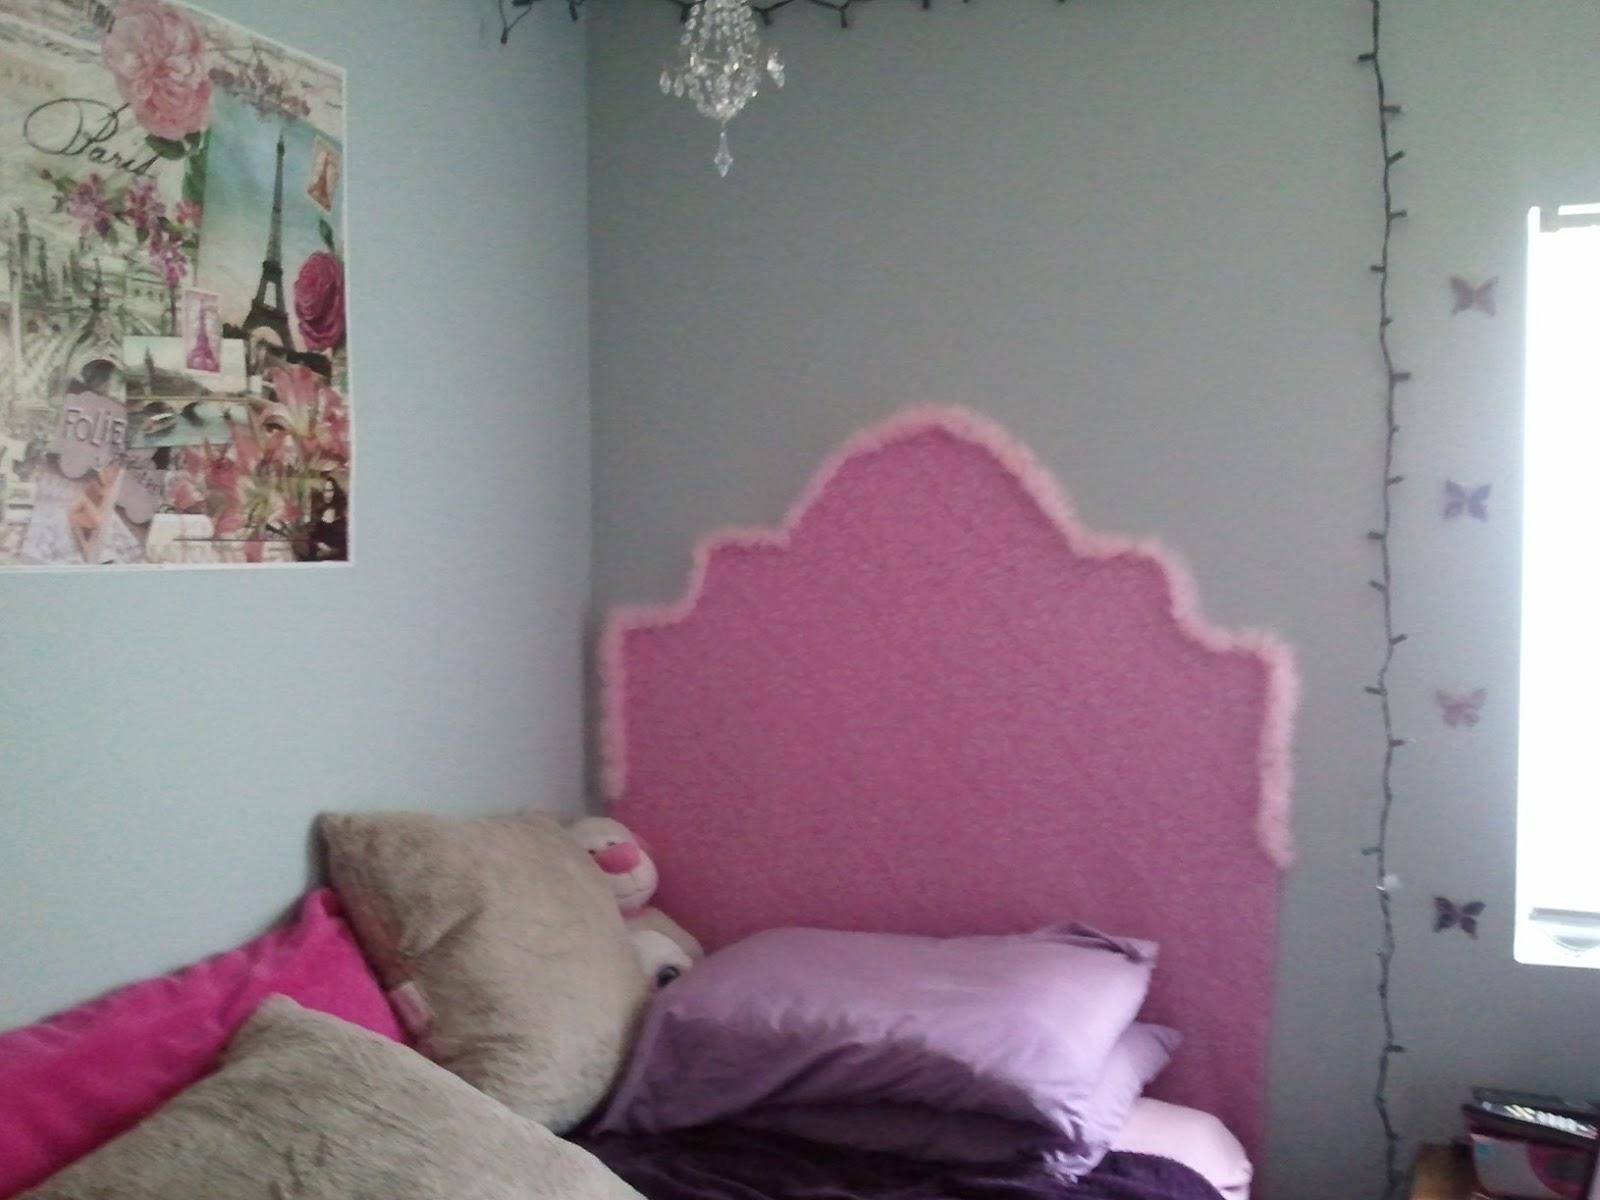 Dorm Room DIY and Crafts: Headboard in ACTION!